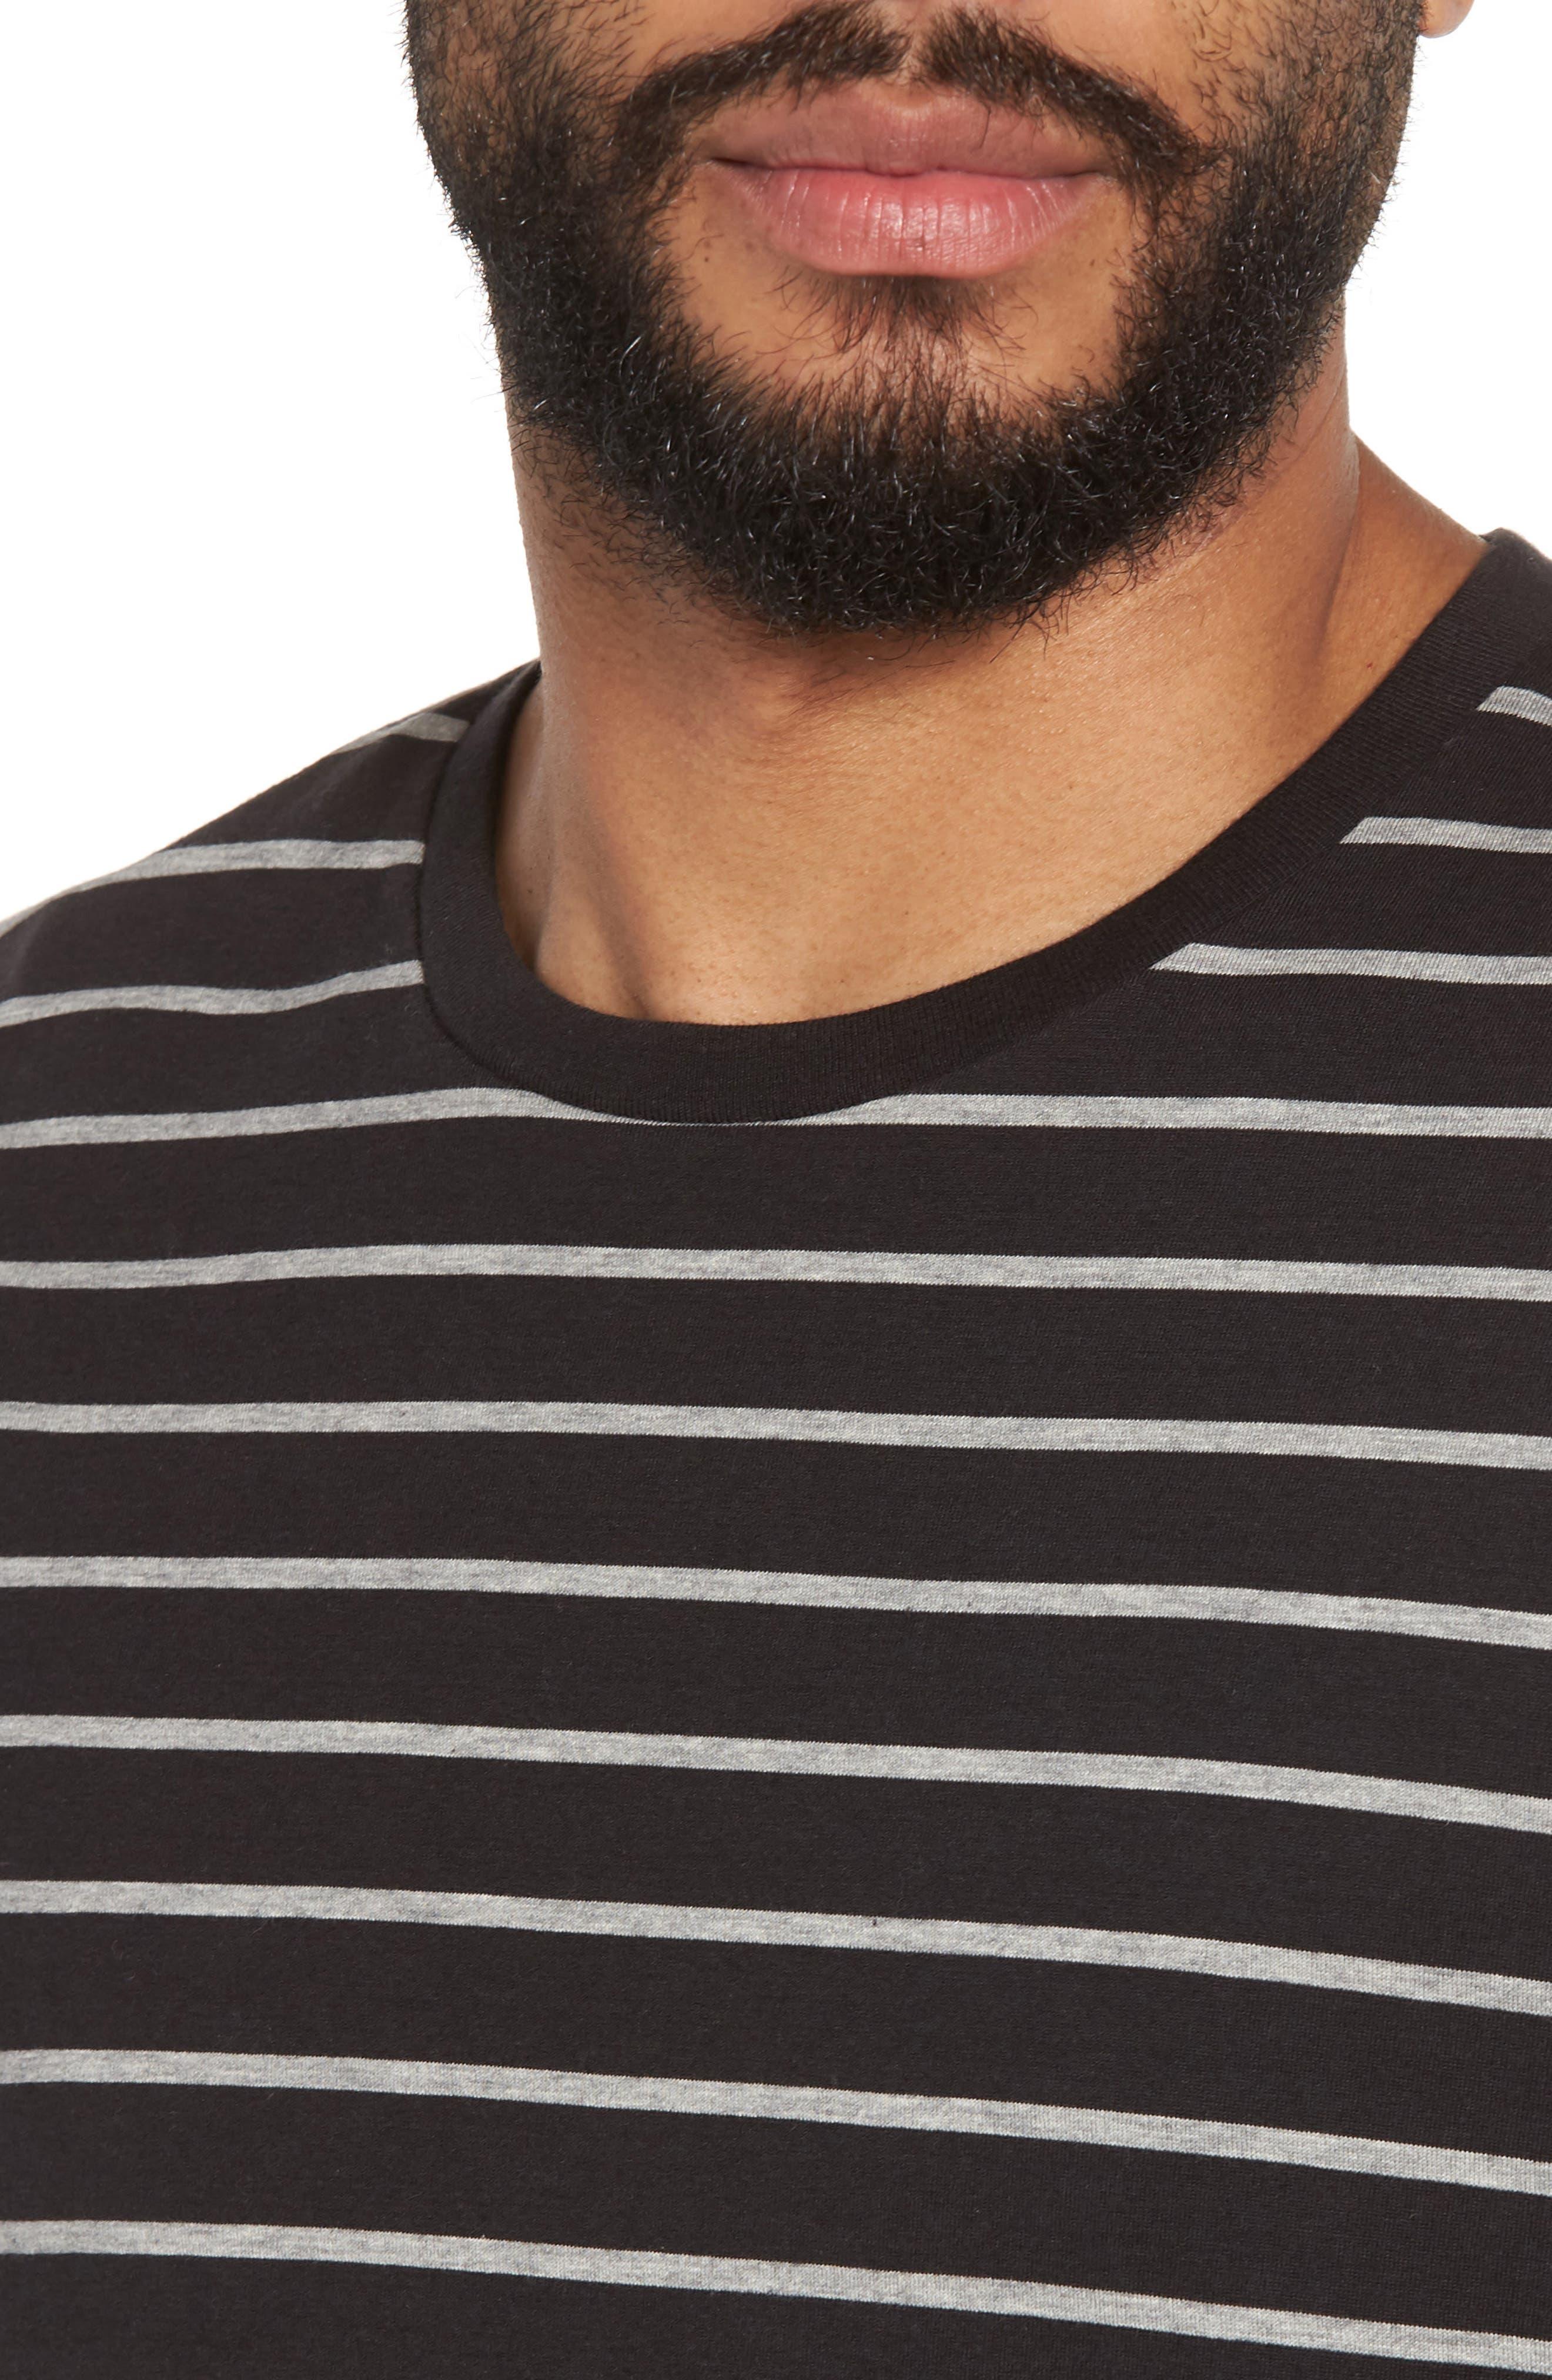 Slim Fit Heathered Stripe T-Shirt,                             Alternate thumbnail 4, color,                             Black/ Heather Steel